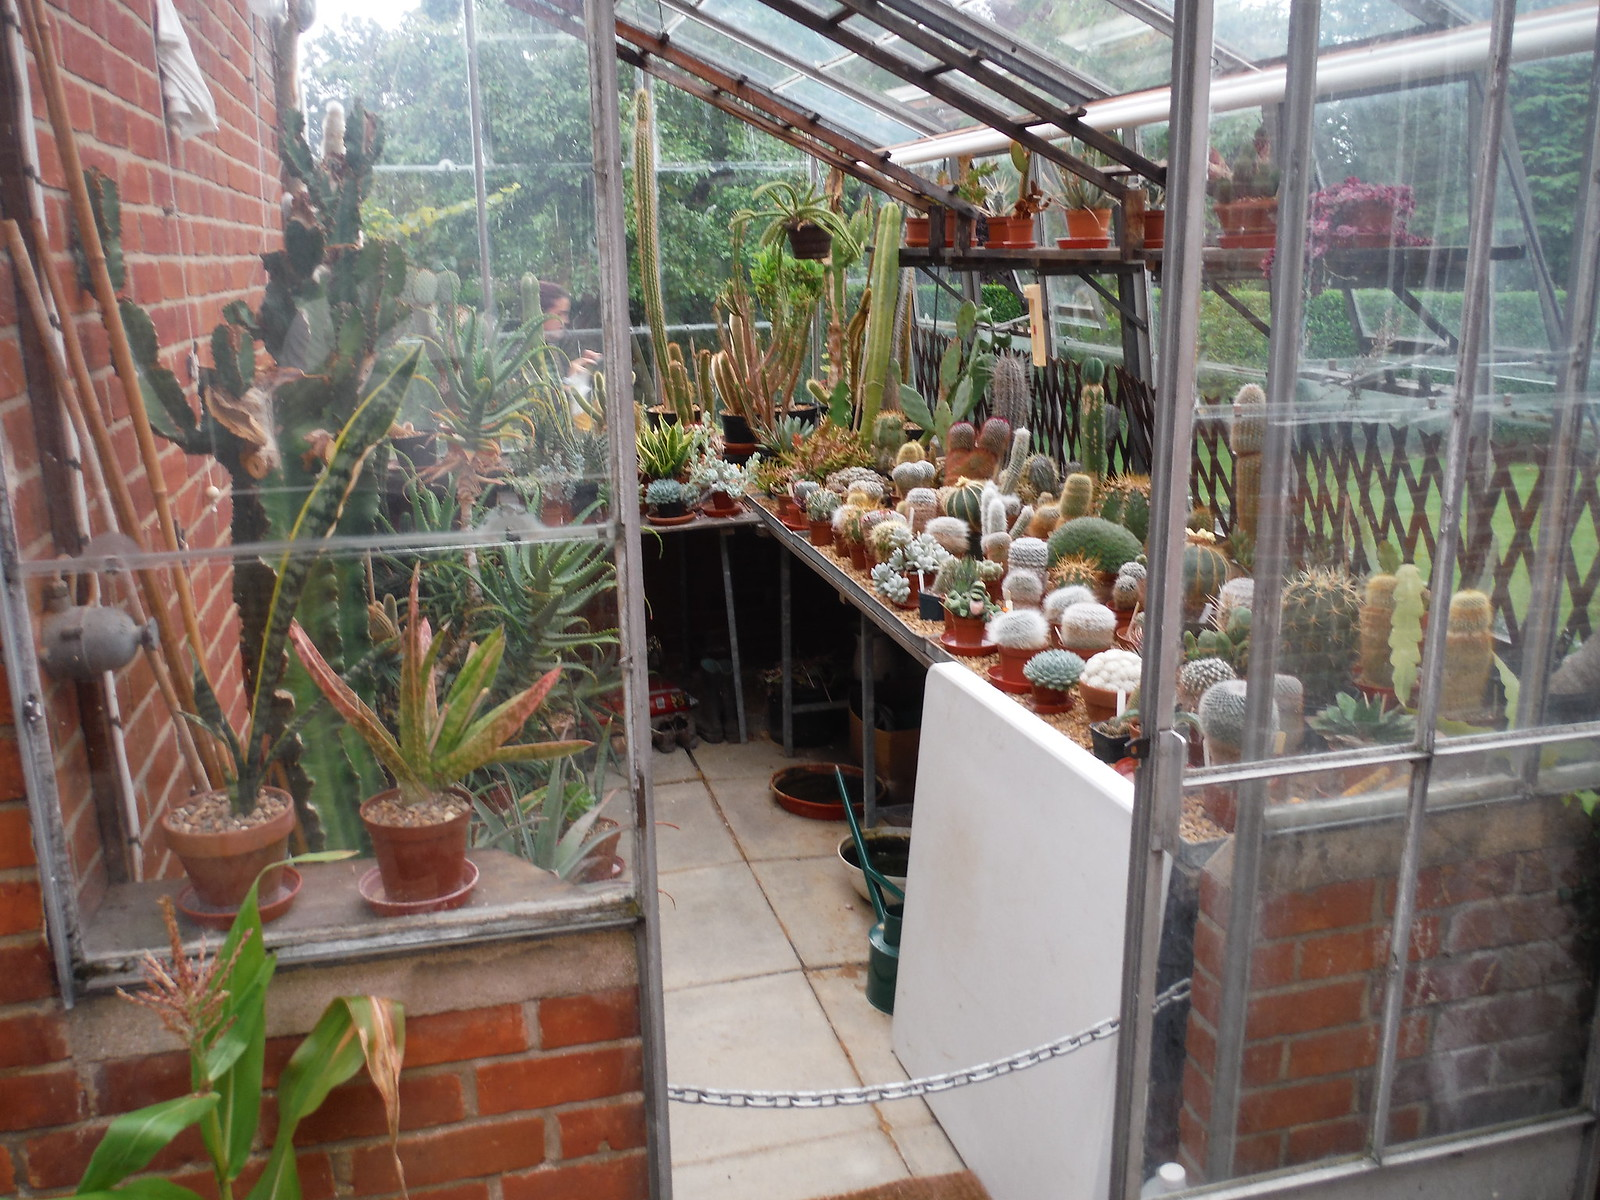 Cactus House (Hoglands) SWC Walk 164 Roydon to Sawbridgeworth via Henry Moore Foundation